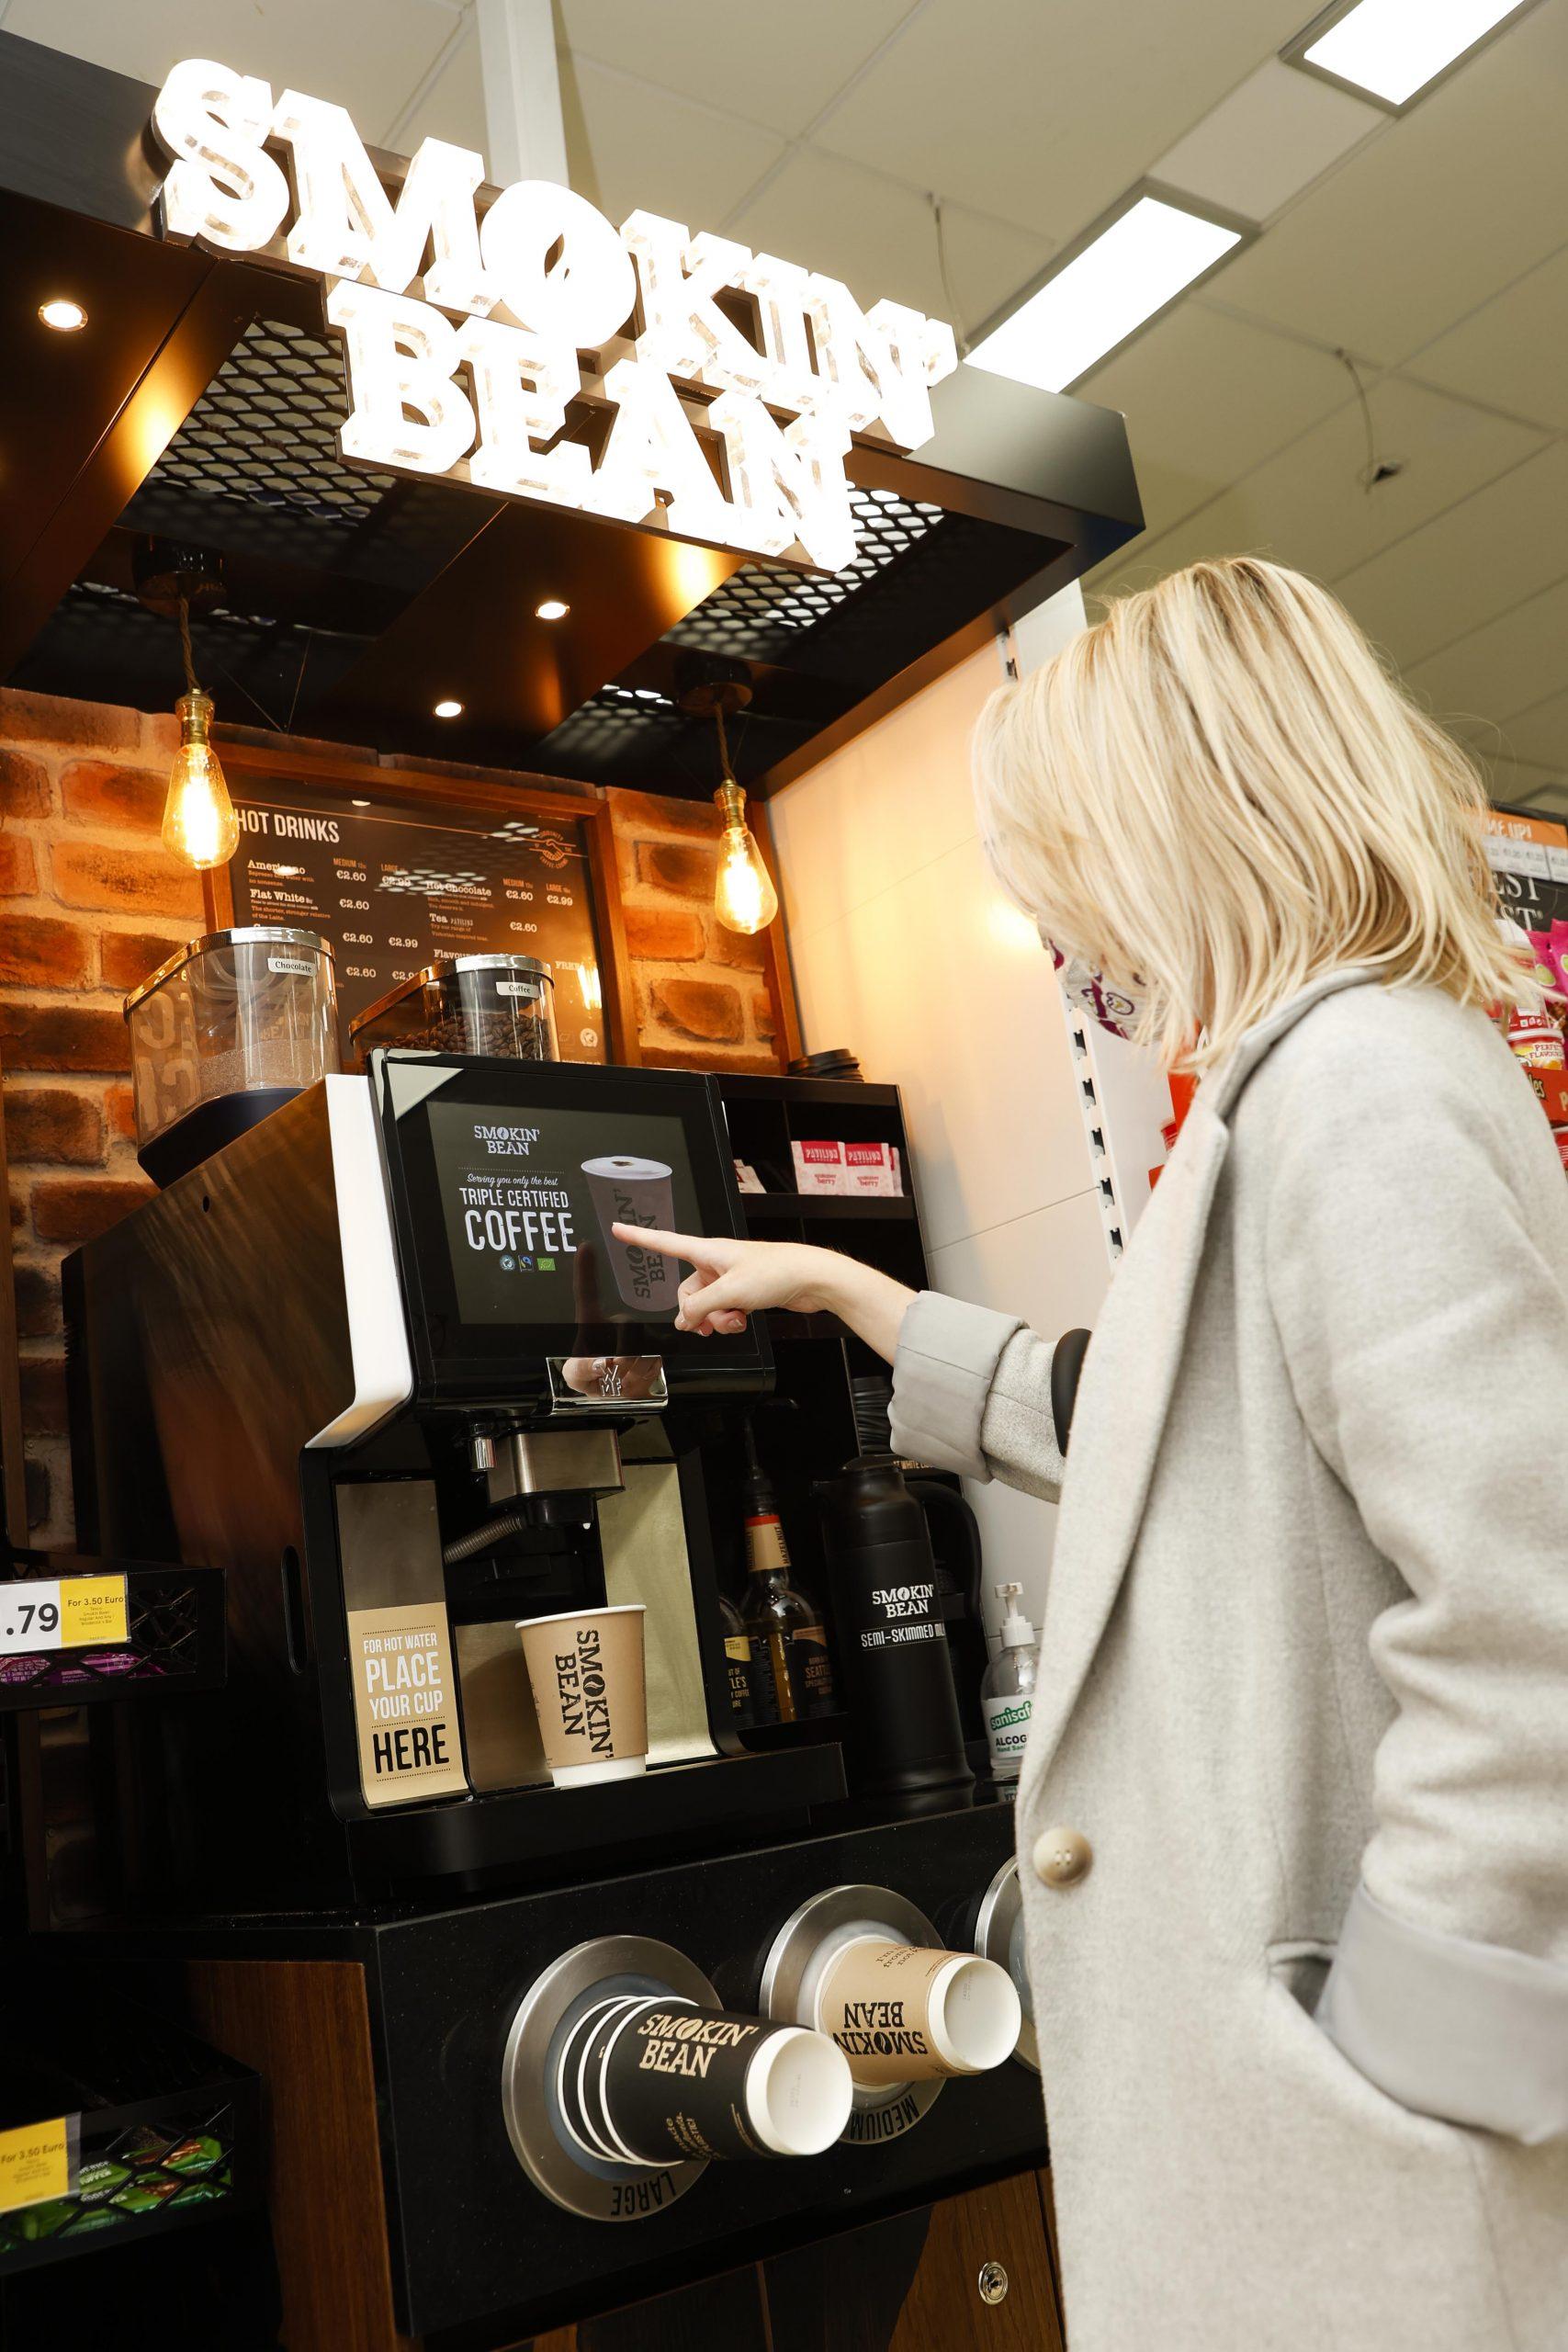 tesco ireland launch smokin' bean coffee